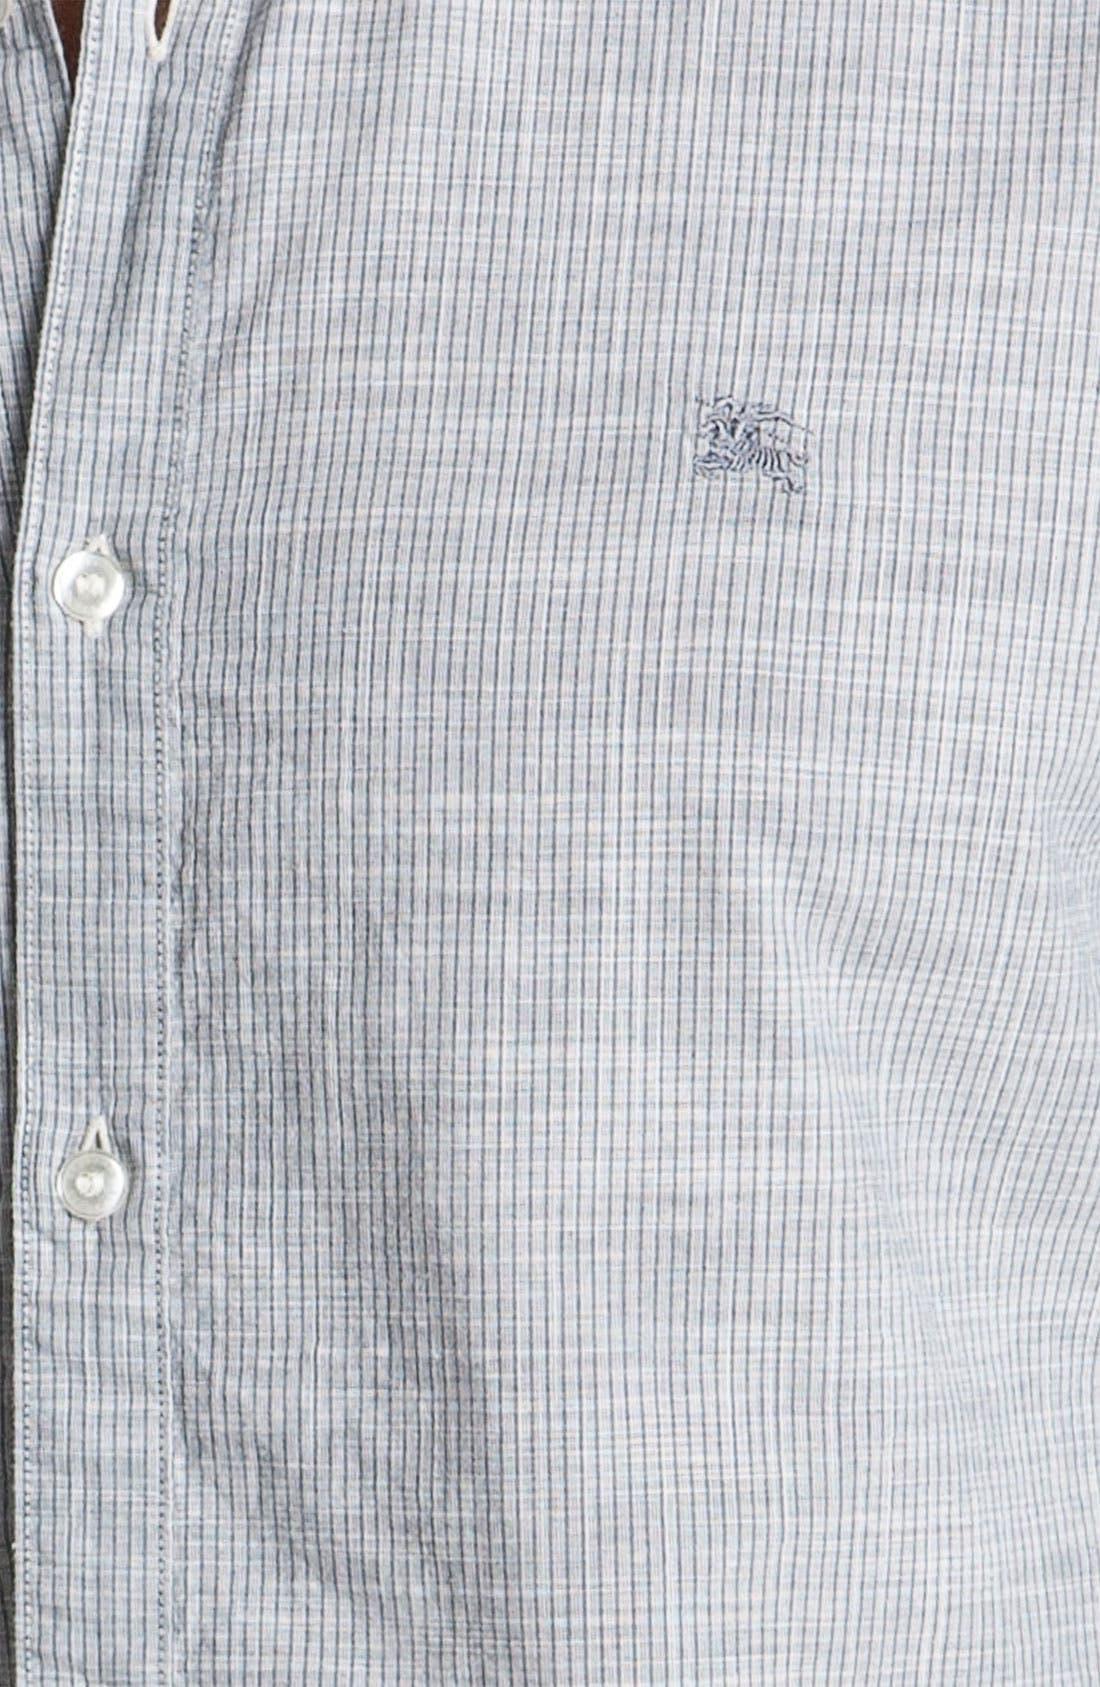 Alternate Image 3  - Burberry Brit Trim Fit Sport Shirt